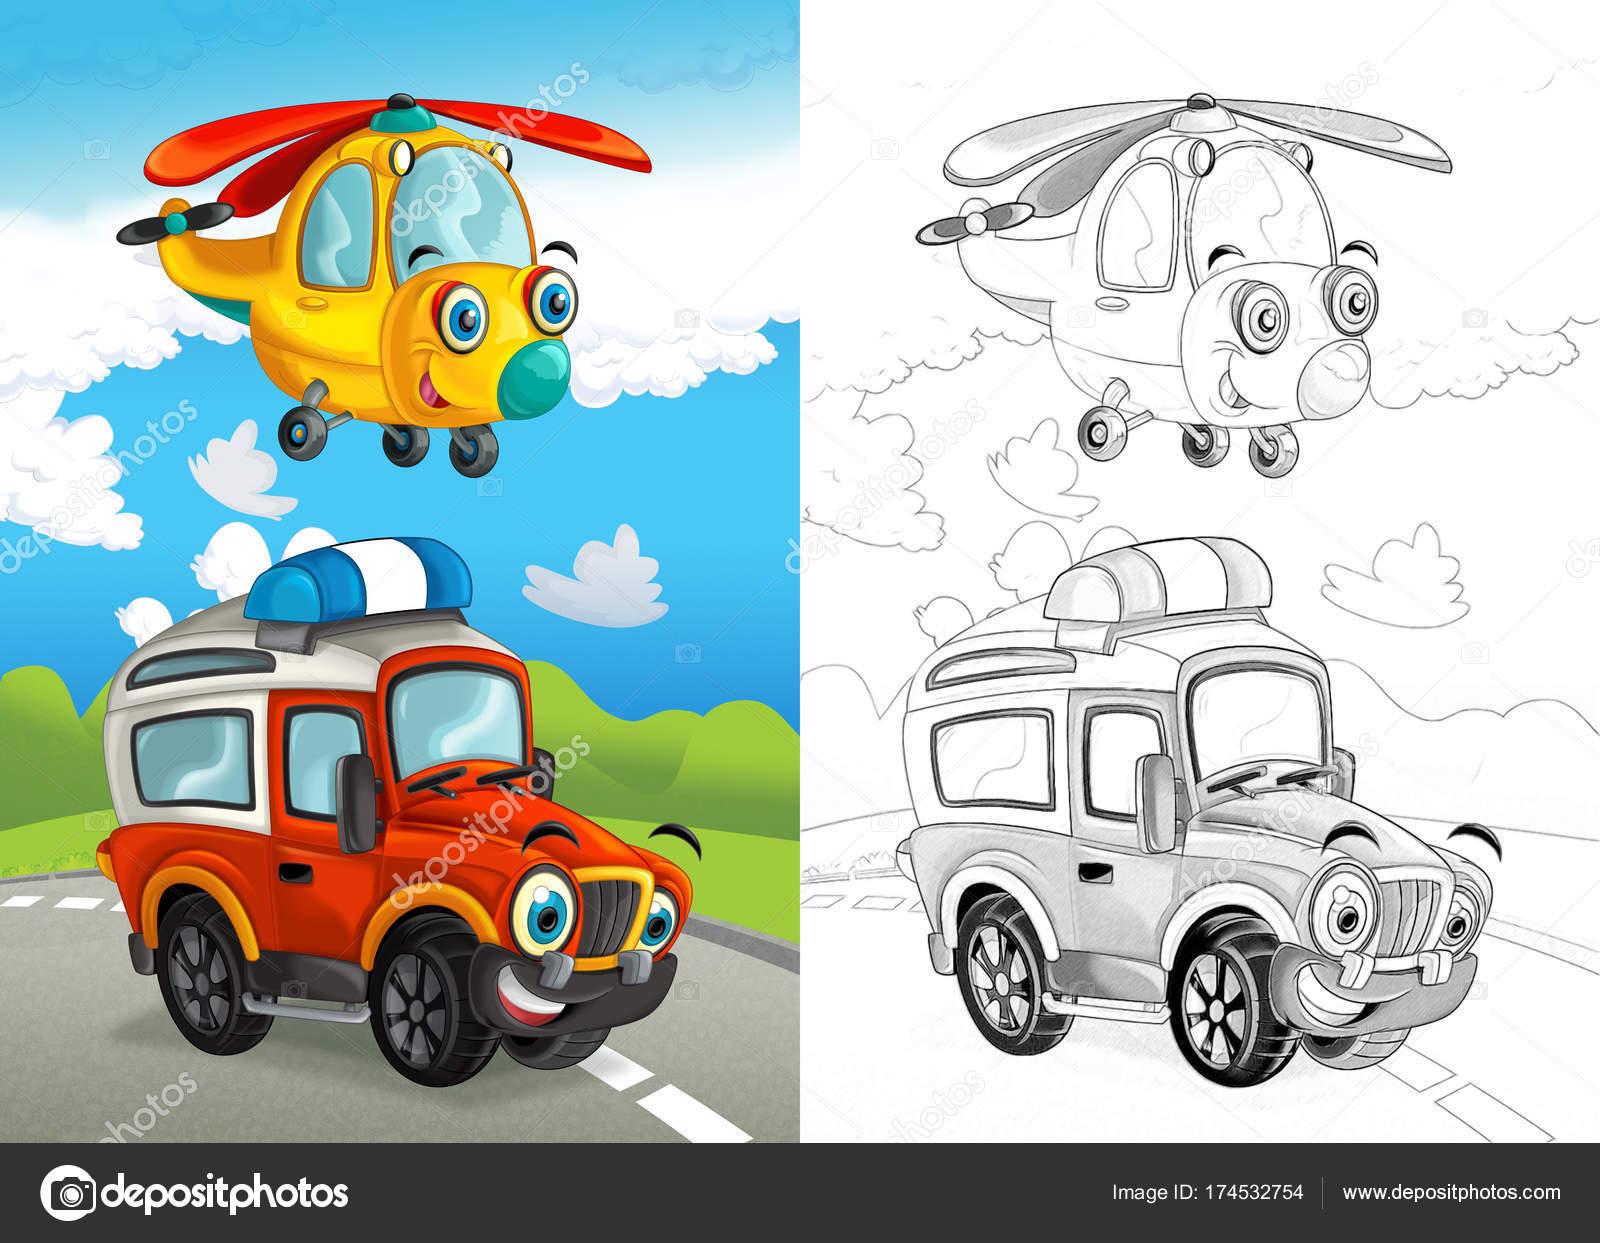 Escena Dibujos Animados Con Bombero Feliz Coche Carretera Camino ...